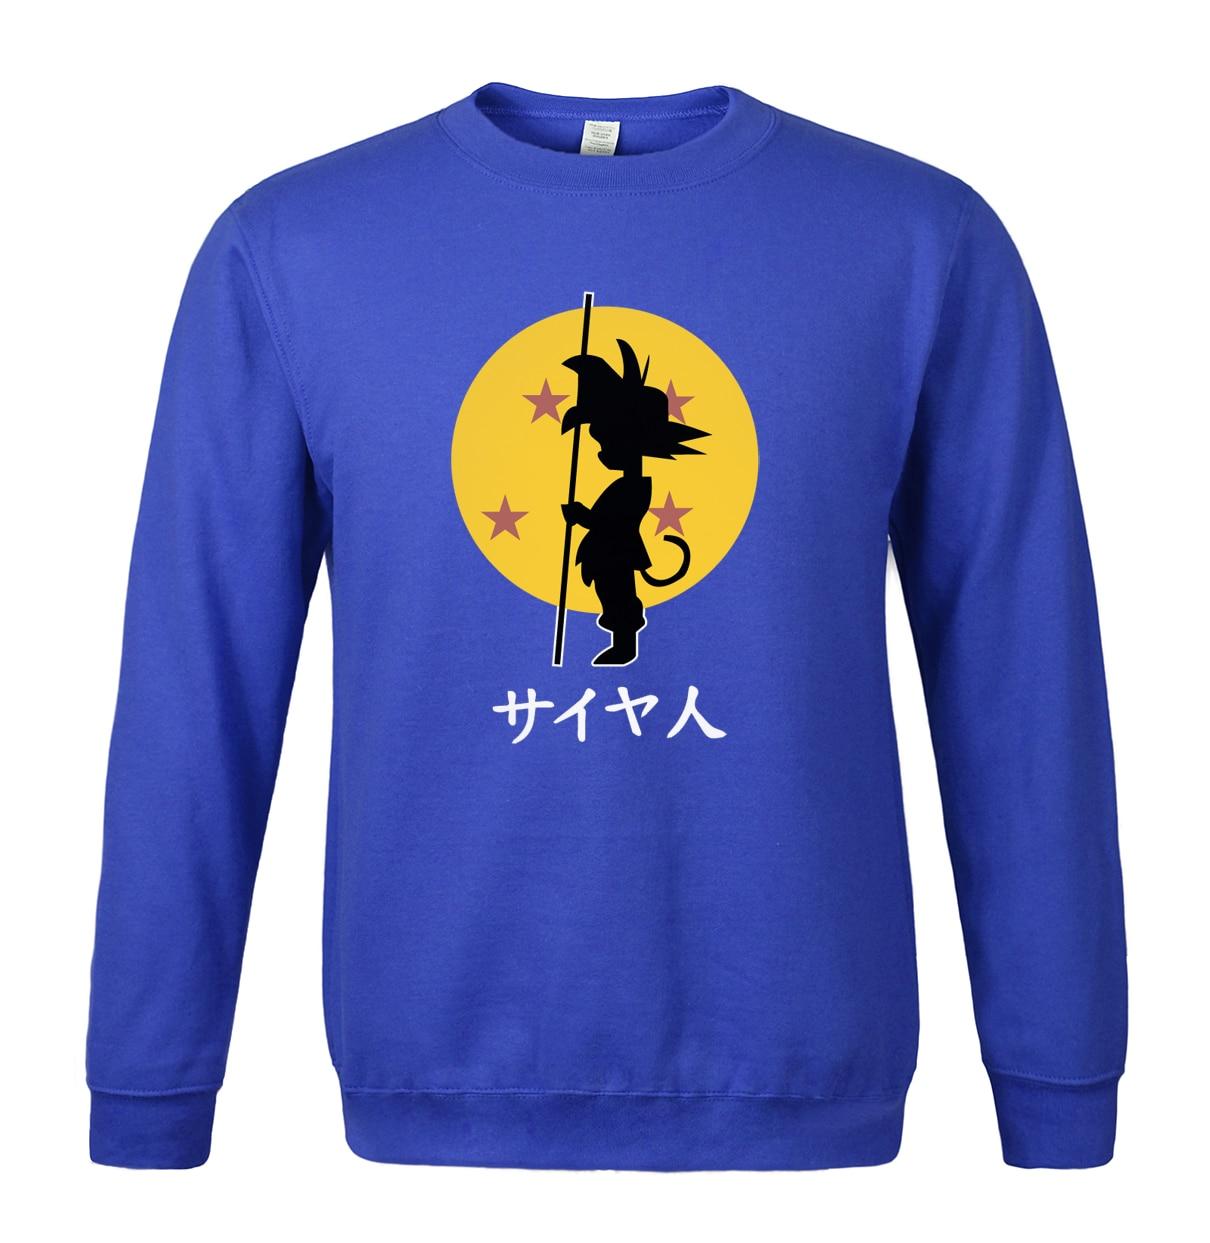 Anime Dragon Ball Z Goku Cartoon Spring winter 2018 sweatshirt men hot sale fashion hoodies O-neck brand clothing tracksuits